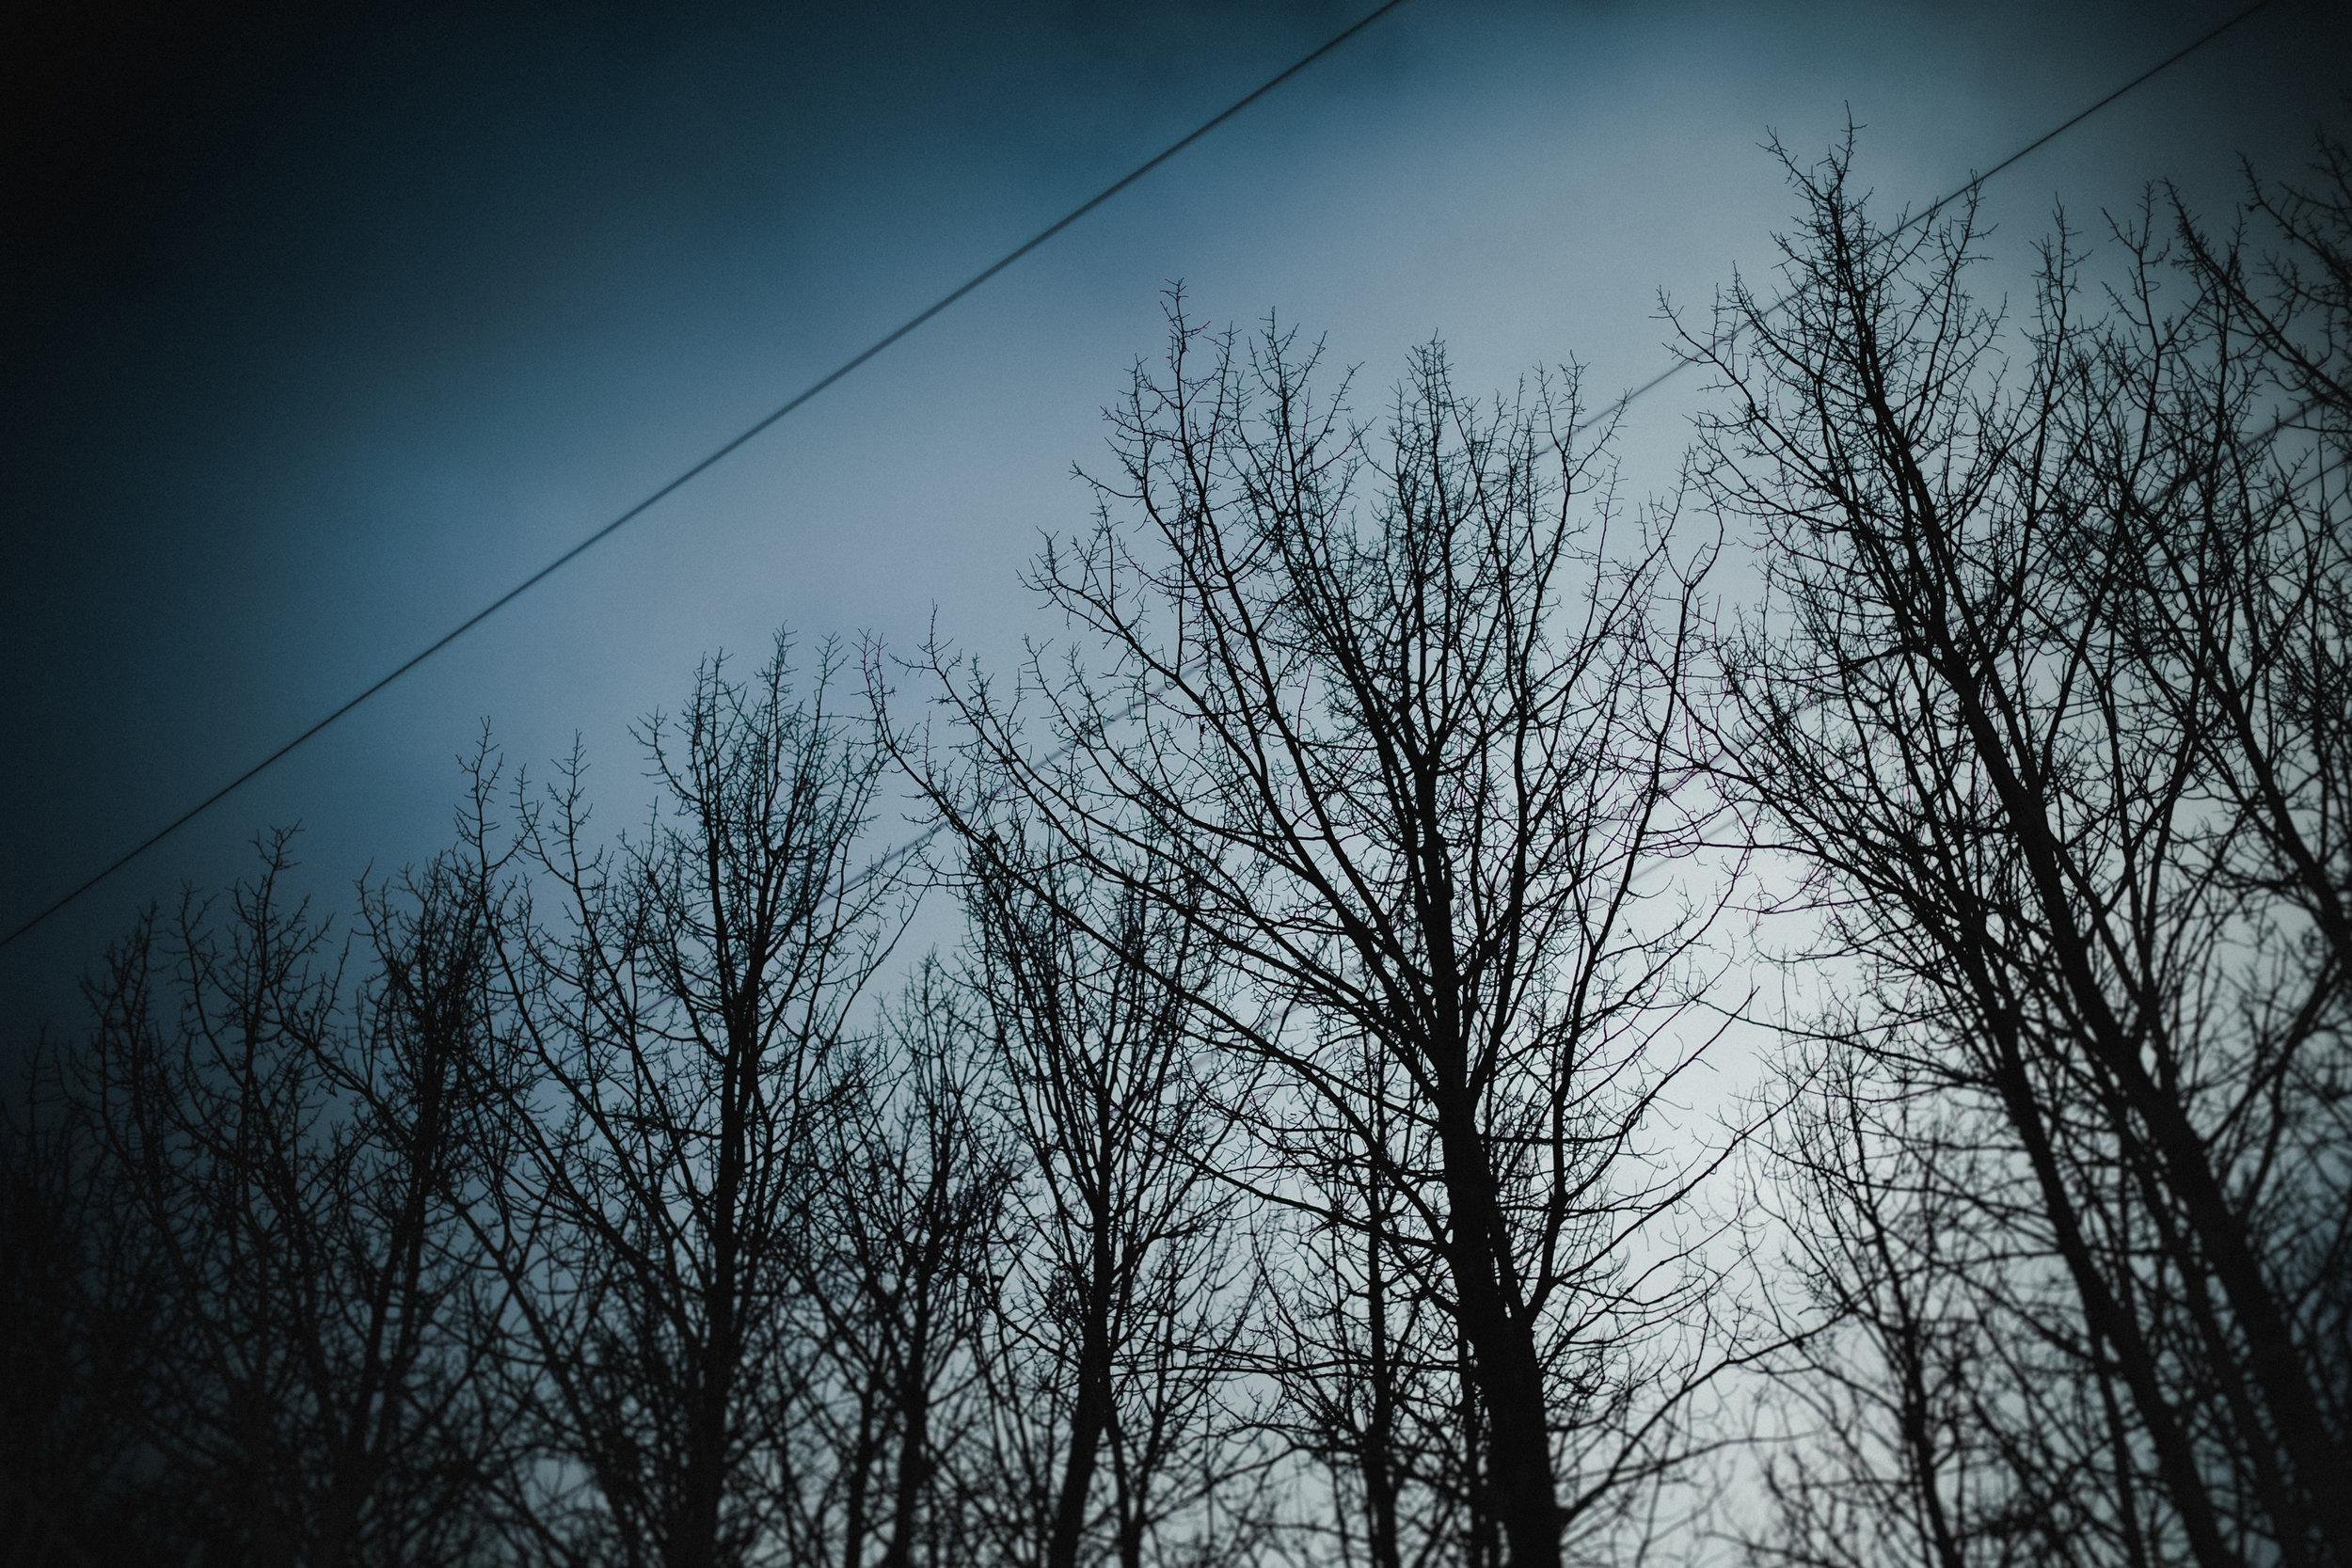 @ThisAlexTakesPics-Instagram-Trees and dark clouds-6.jpg